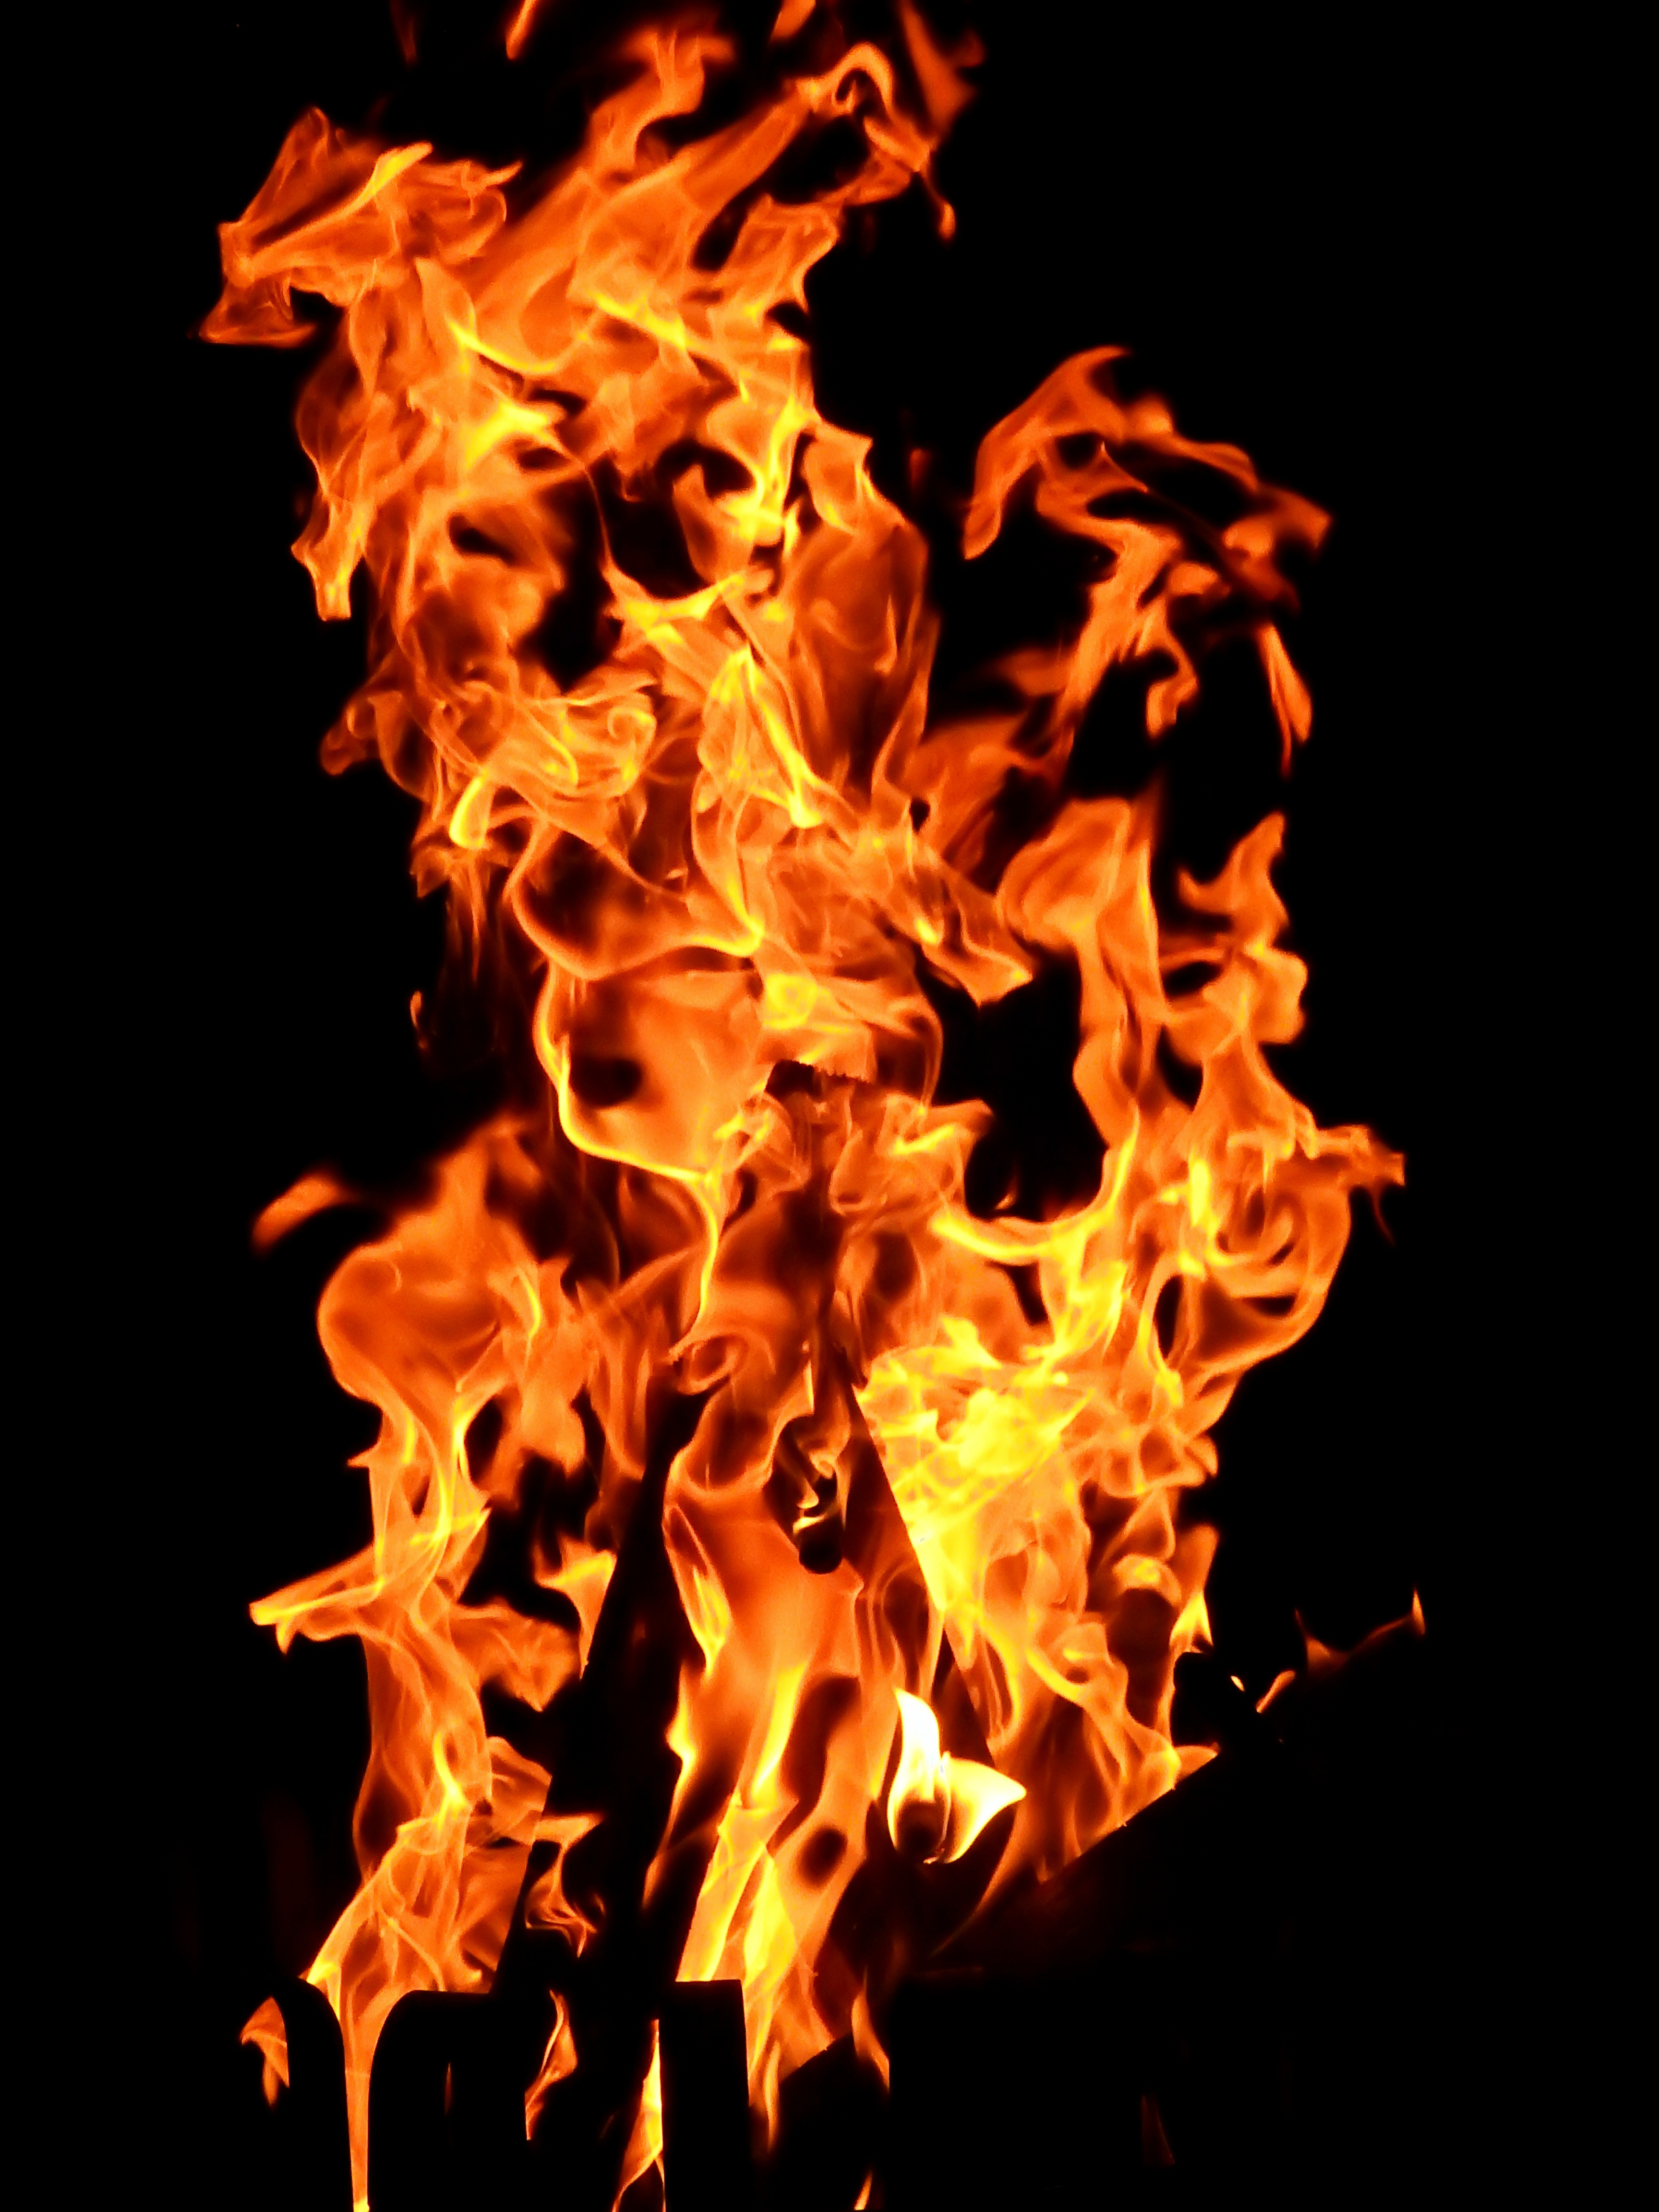 fire wallpaper free stock